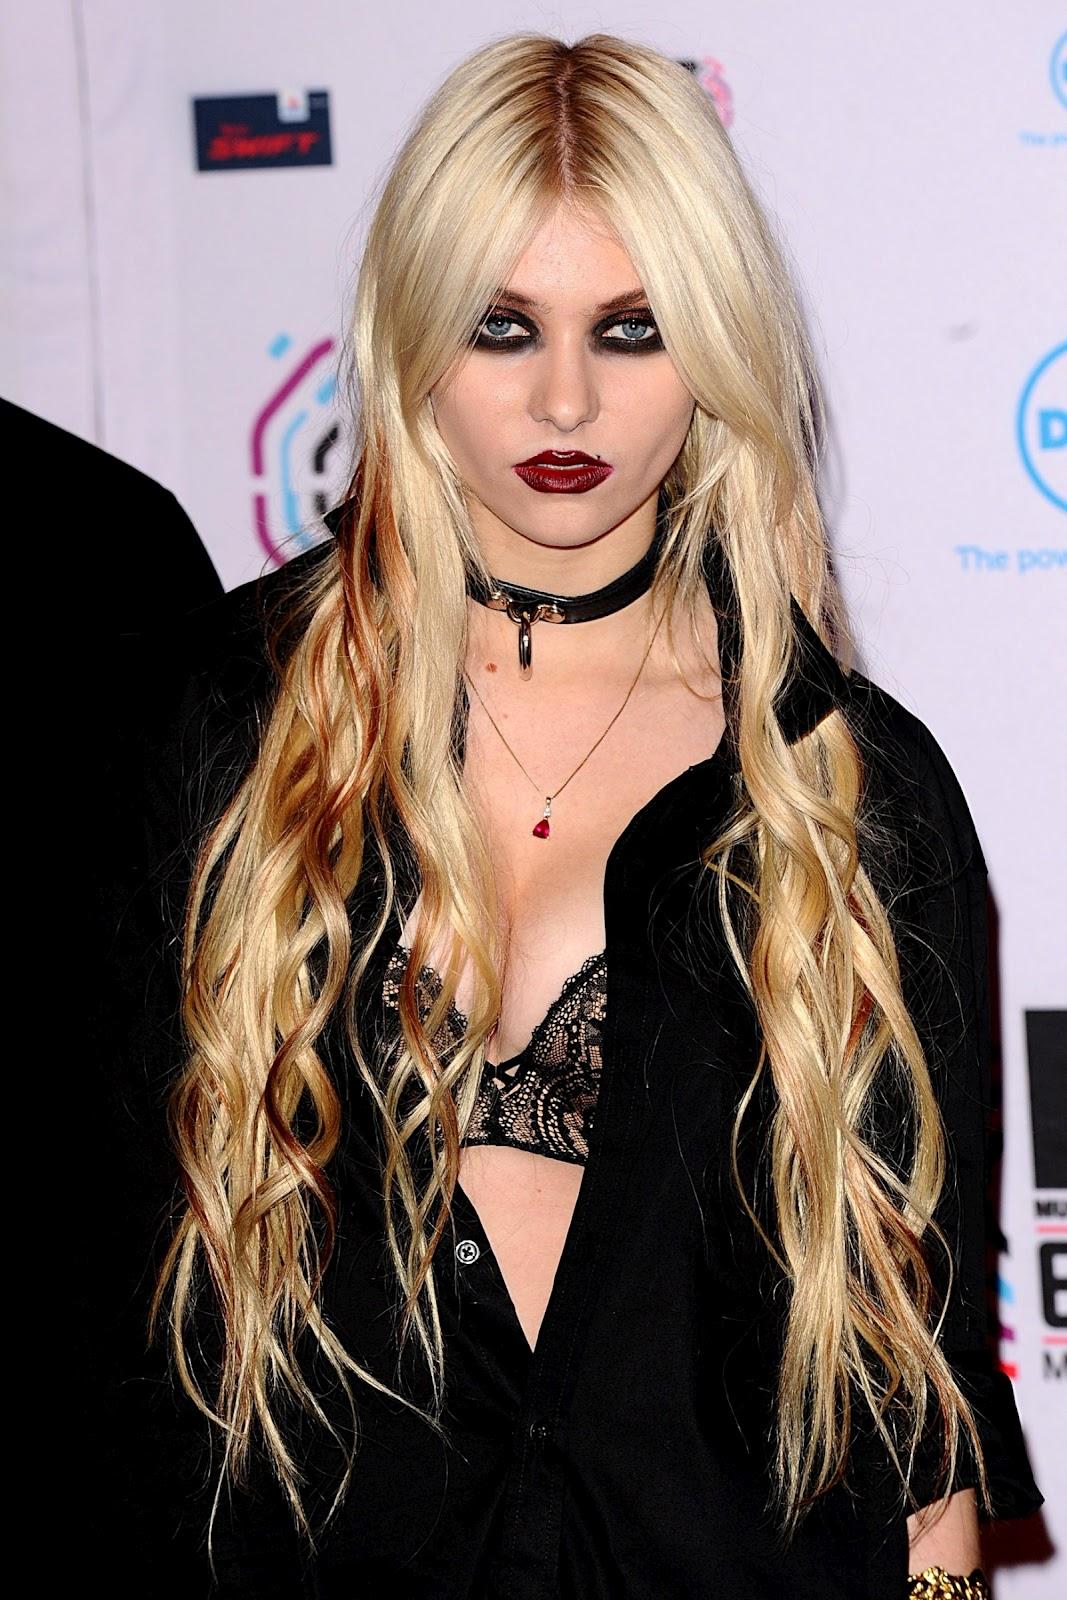 http://1.bp.blogspot.com/-AryDg9Y0ZqI/UAK9fcb_TSI/AAAAAAAAAzM/KqJNWbL17wU/s1600/Taylor-Momsen-rock-girl.jpg